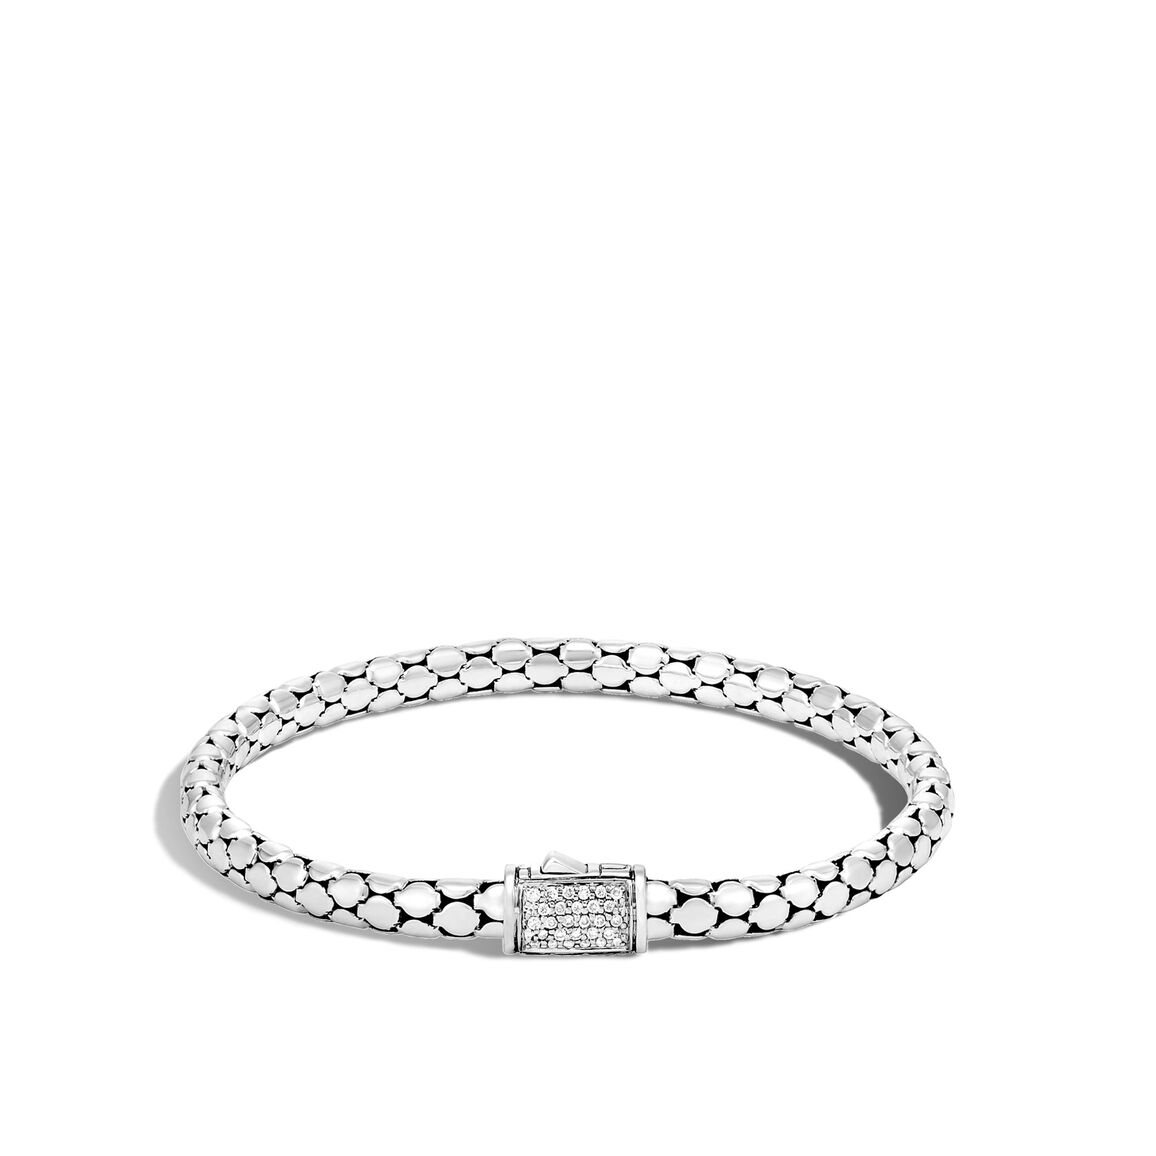 Dot 4.5MM Bracelet in Silver with Diamonds